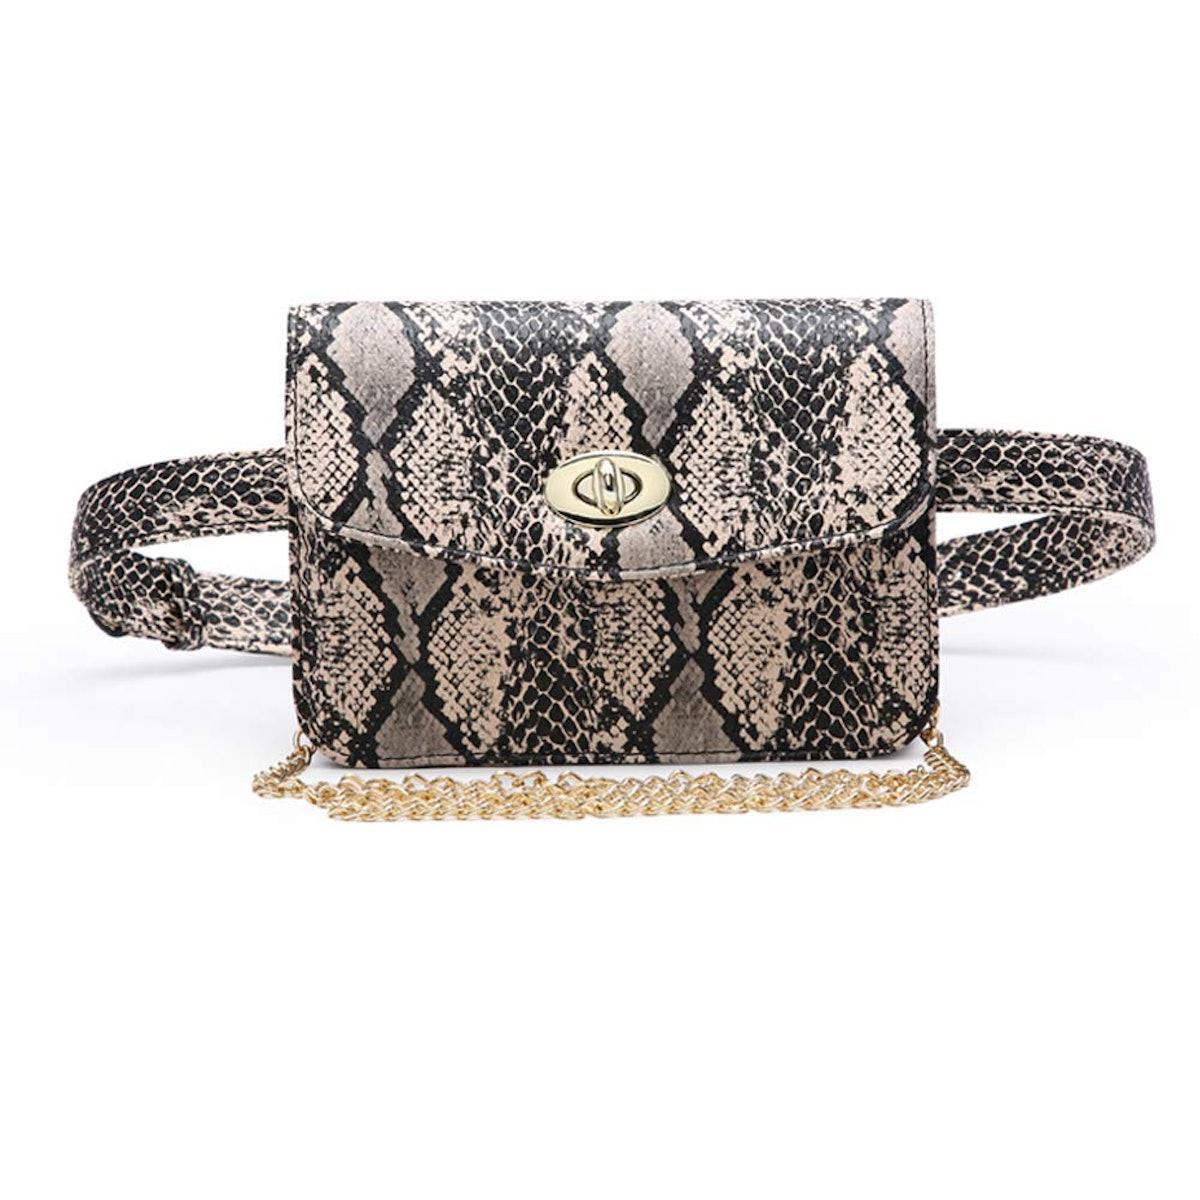 Small PU Leather Elegant Fanny Pack Belt Bag Purse Snakeskin Pattern